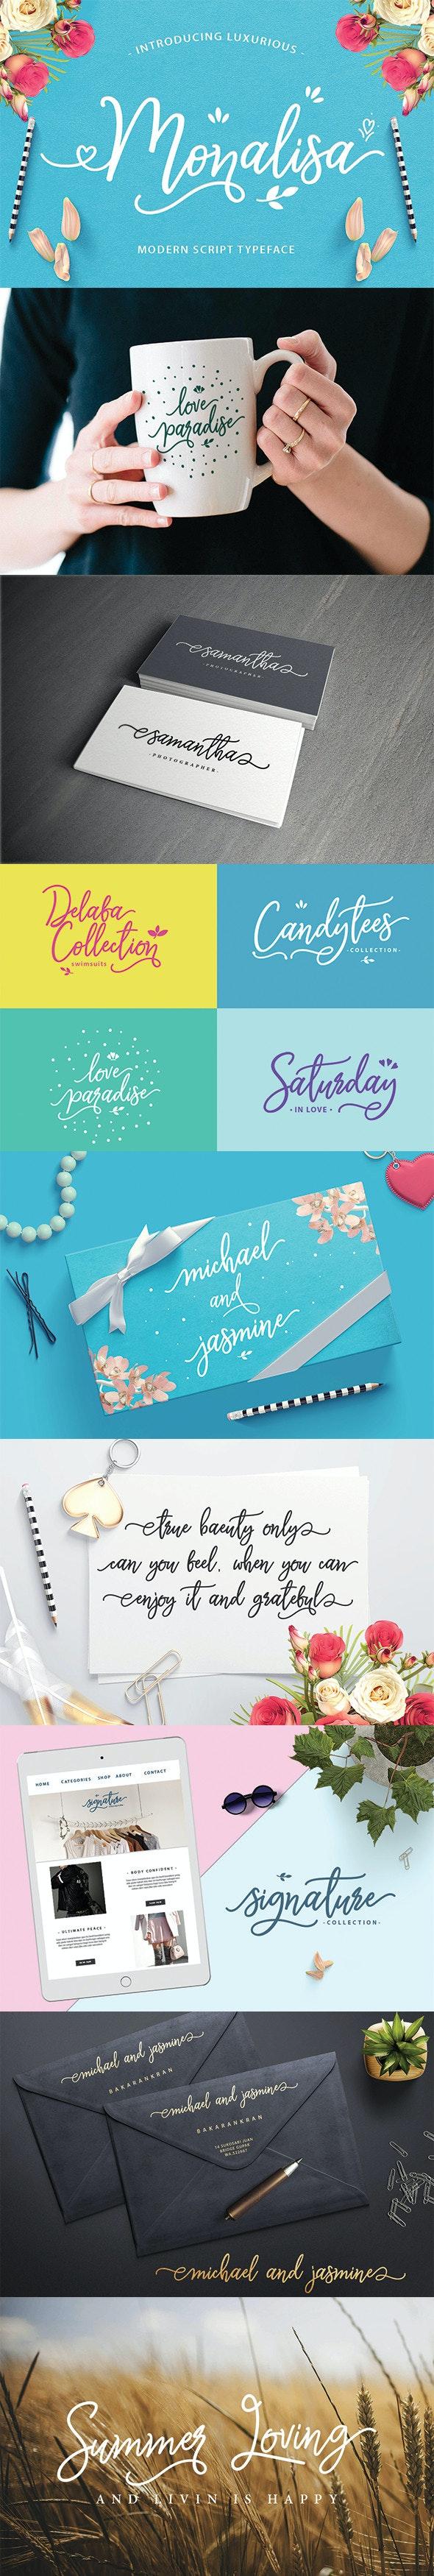 Monalisa Font - Hand-writing Script